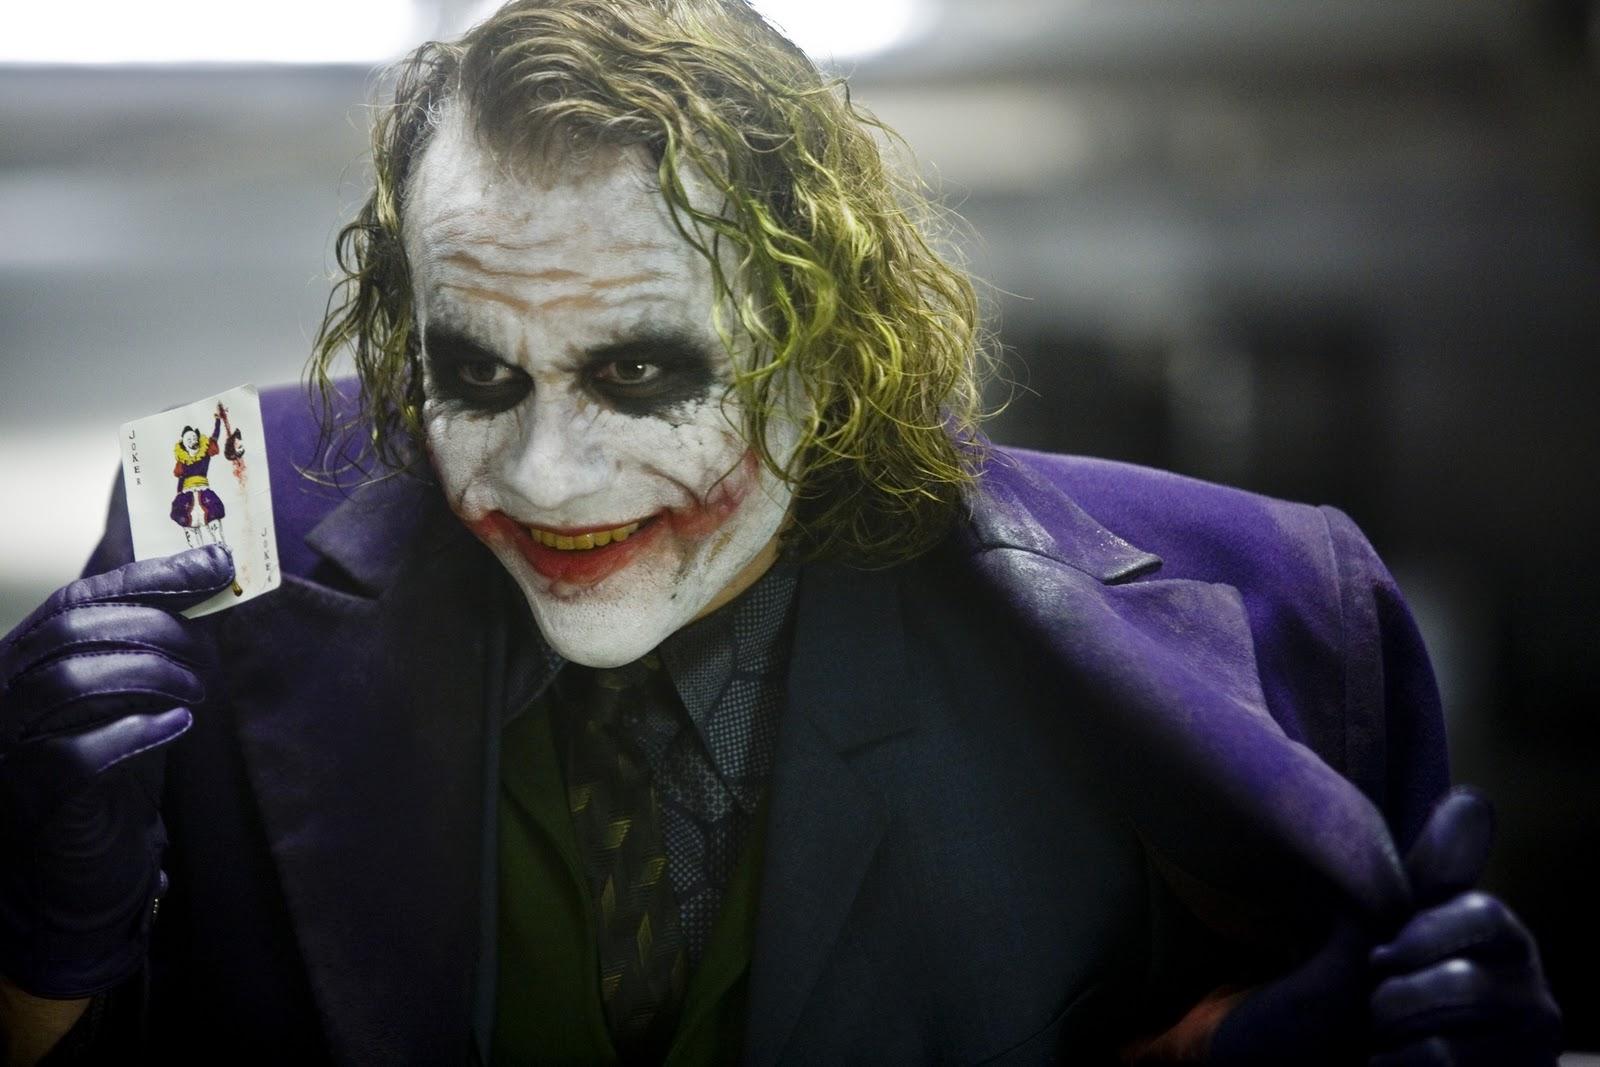 http://2.bp.blogspot.com/-IqiFYzPDpq8/TqzKeJt_7dI/AAAAAAAACmk/5BuprhxZXaQ/s1600/Heath+Ledger+as+The+Joker+in+The+Dark+Knight.jpg